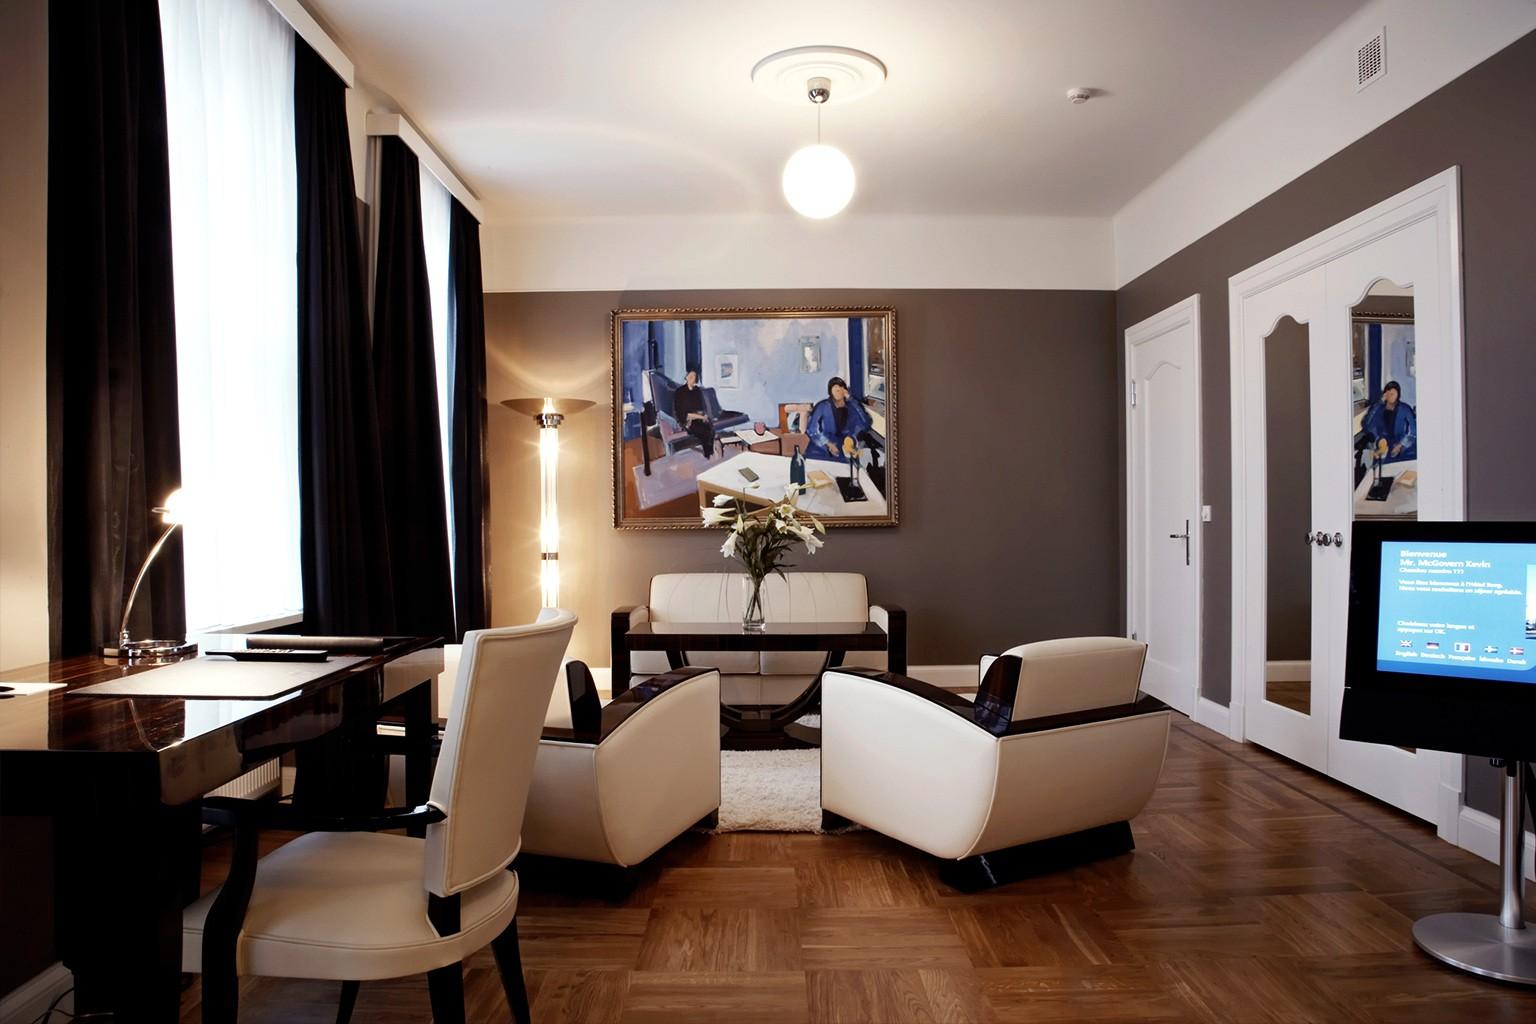 Hotel borg in reykjavik luxushotel bei designreisen for Design hotel reykjavik